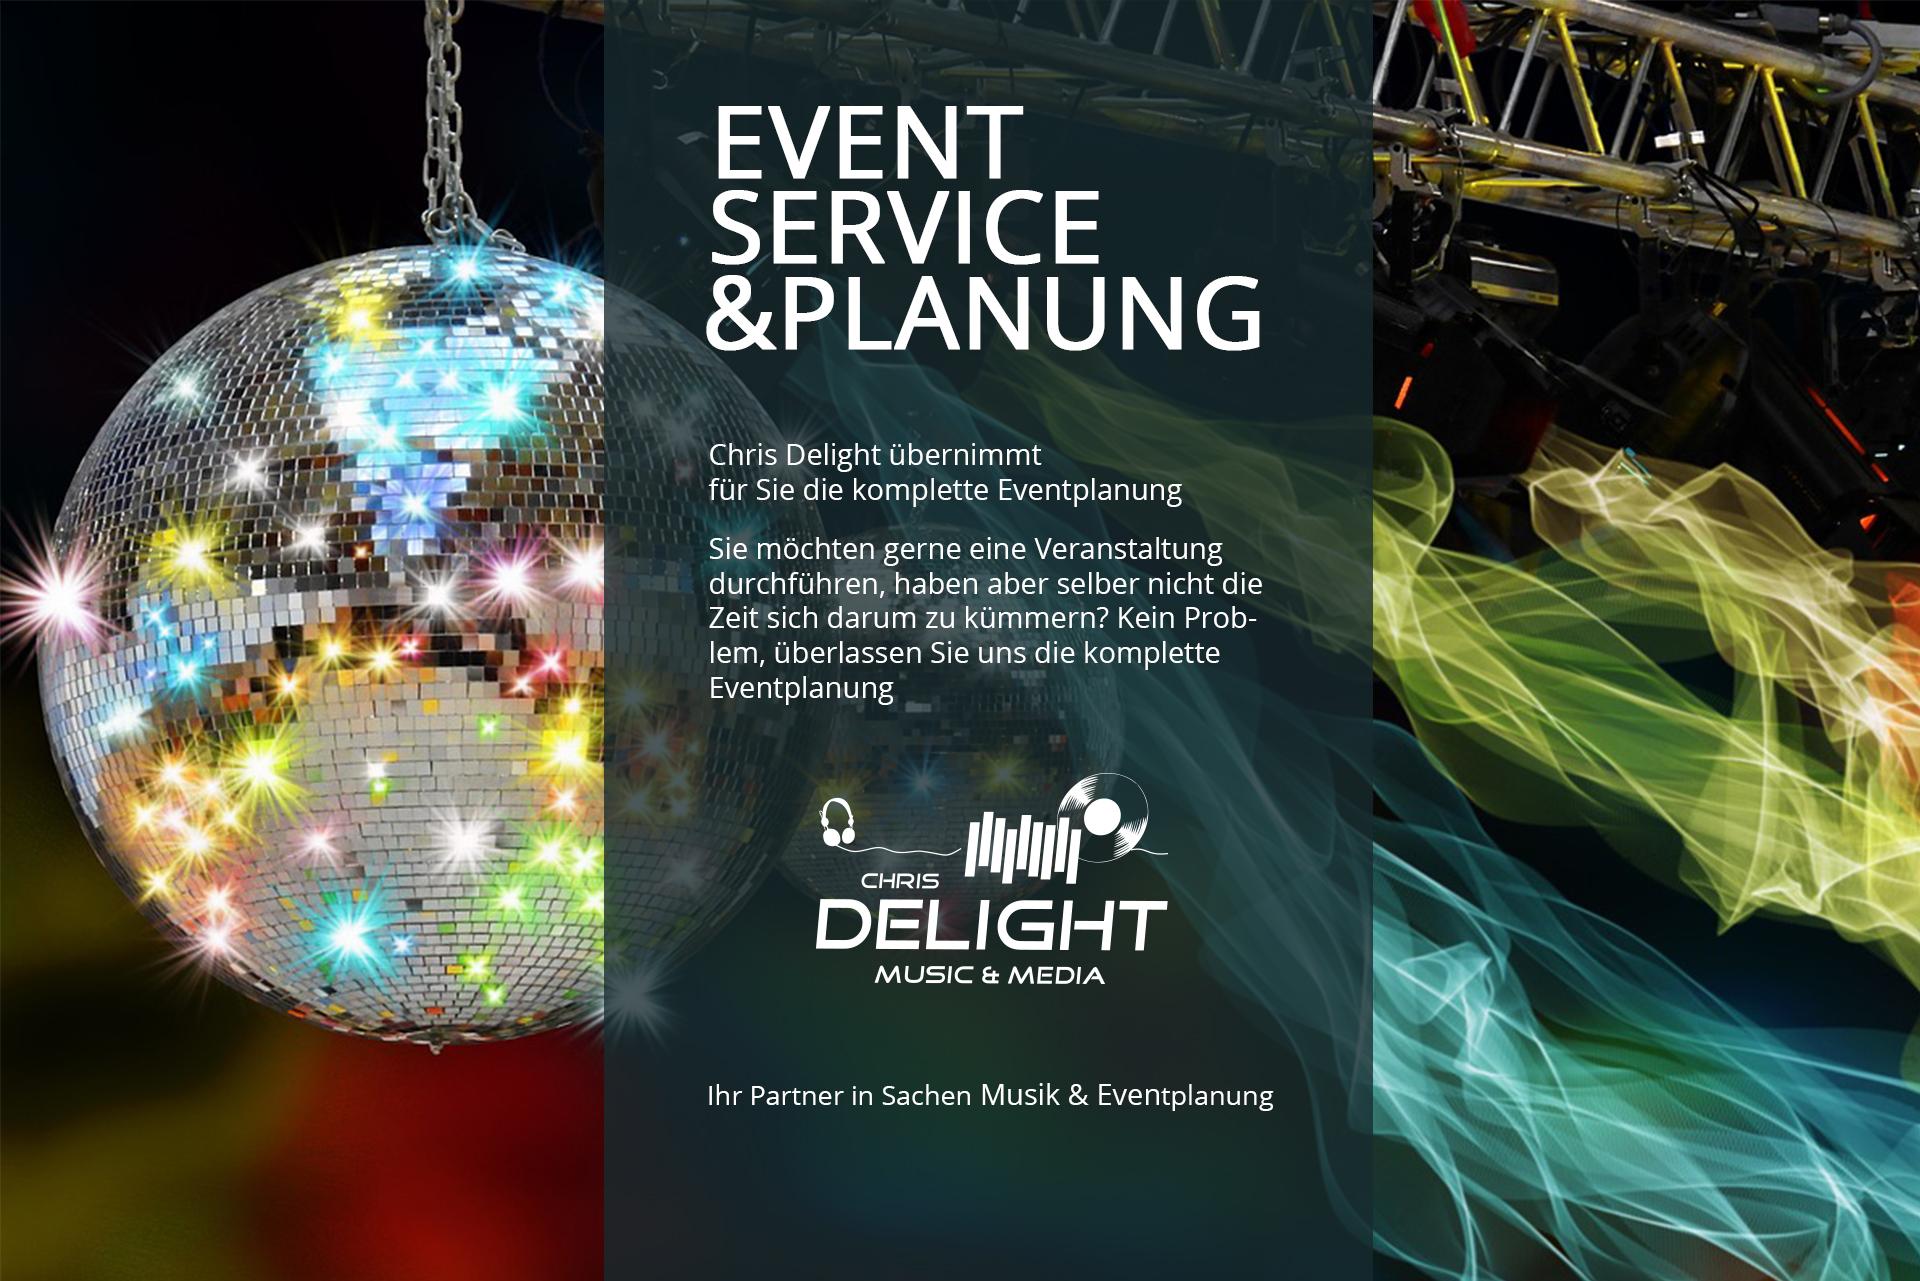 Eventservice & Planung